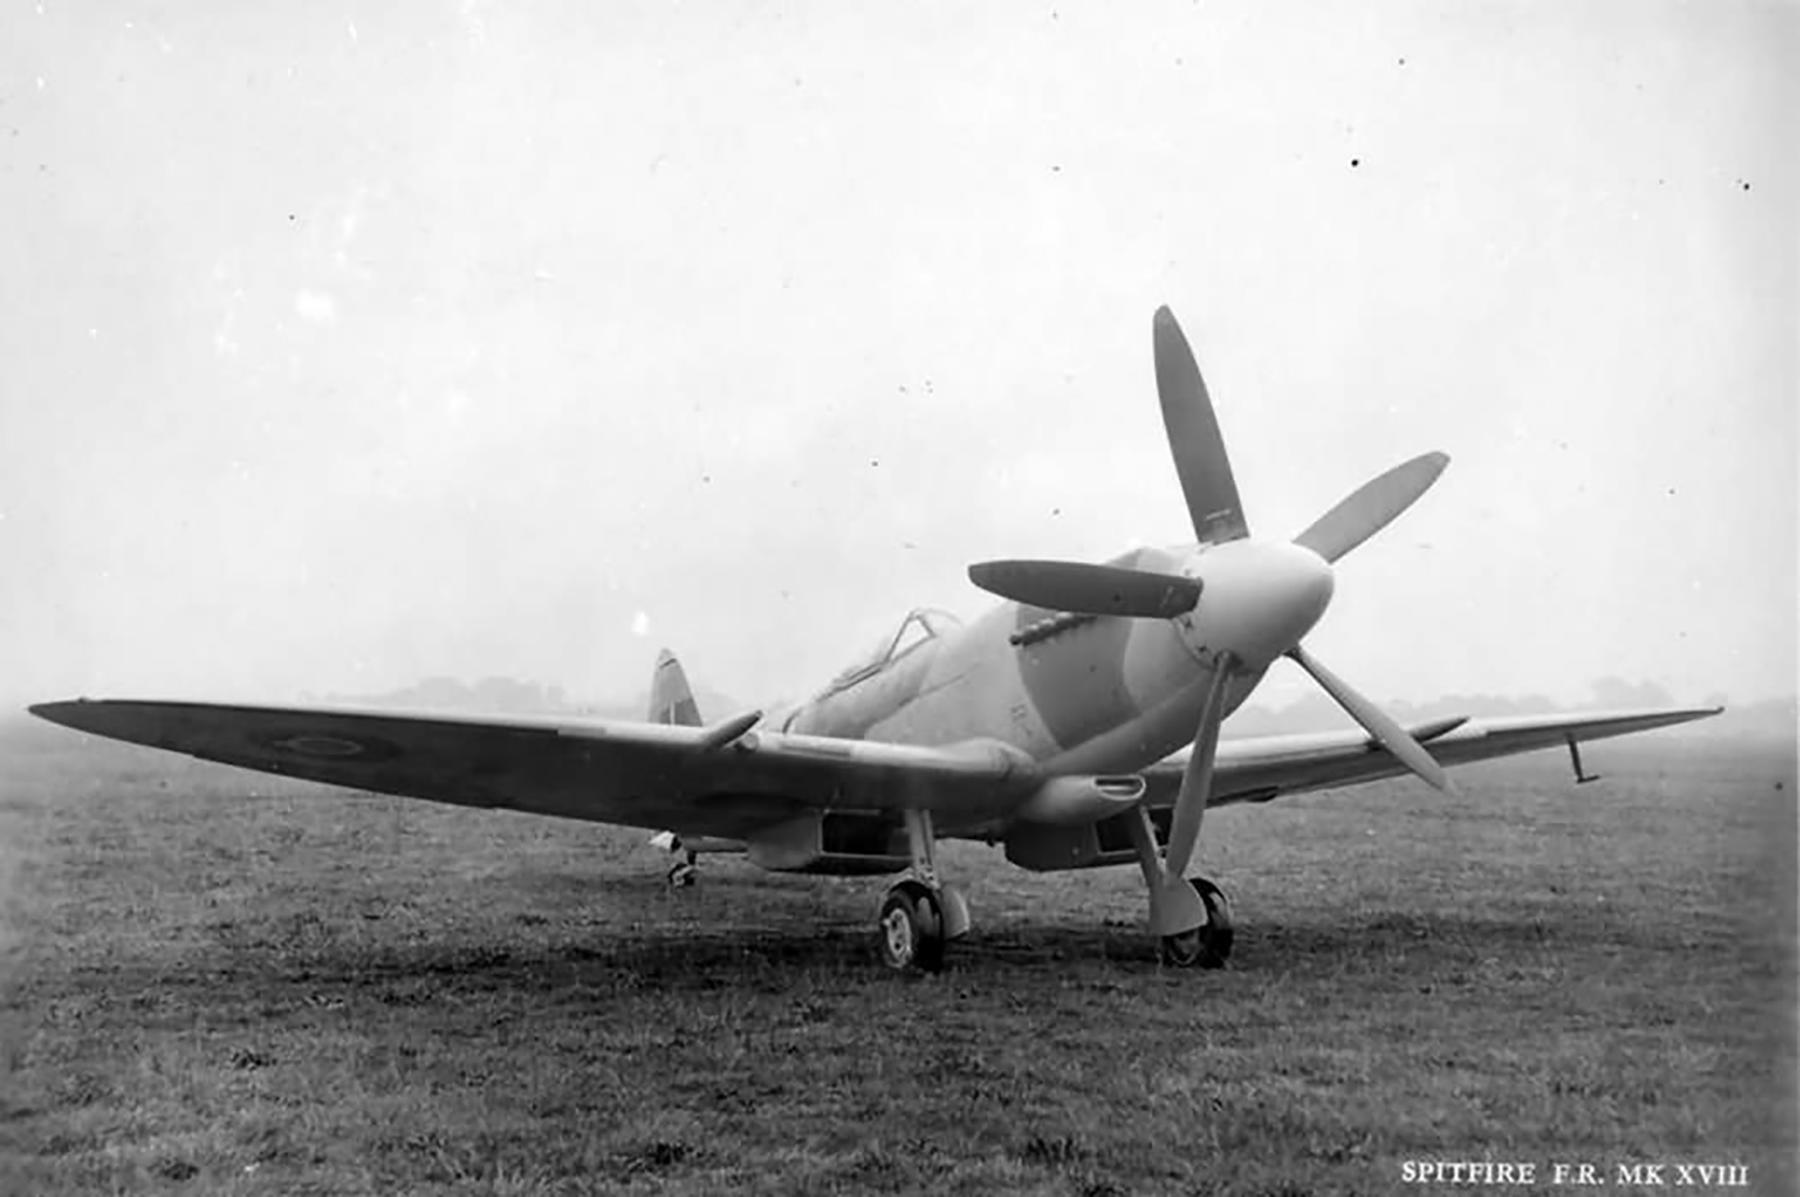 Spitfire FR18 on the ground England Jun 1945 web 01